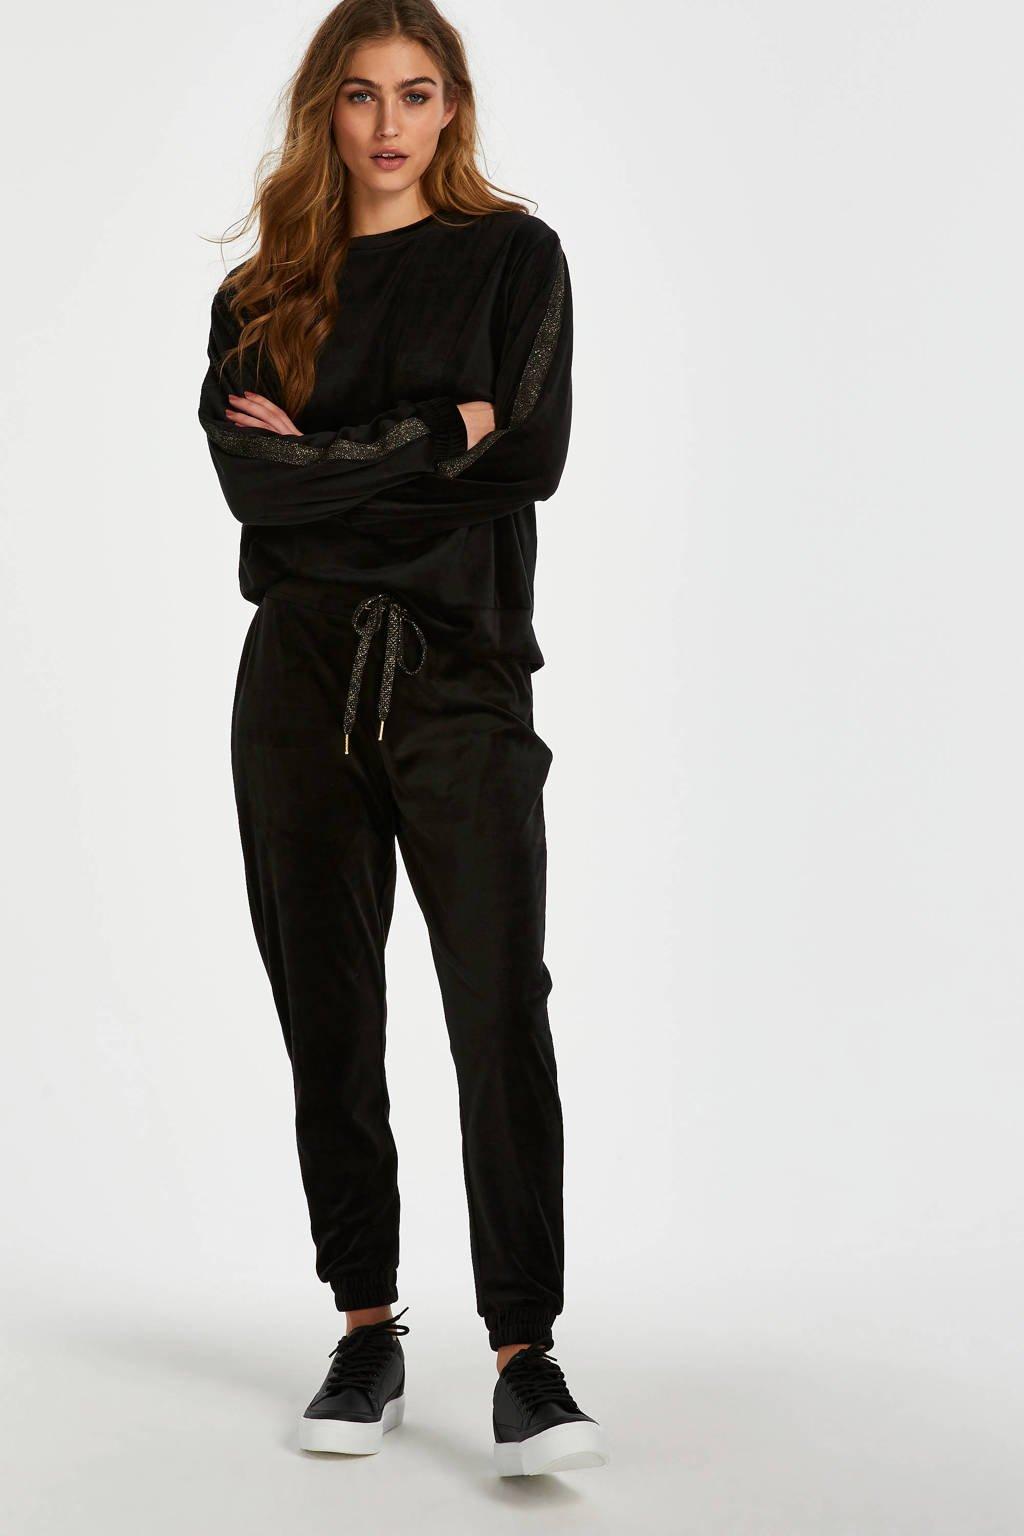 Hunkemöller velours loungebroek zwart, Zwart/goud